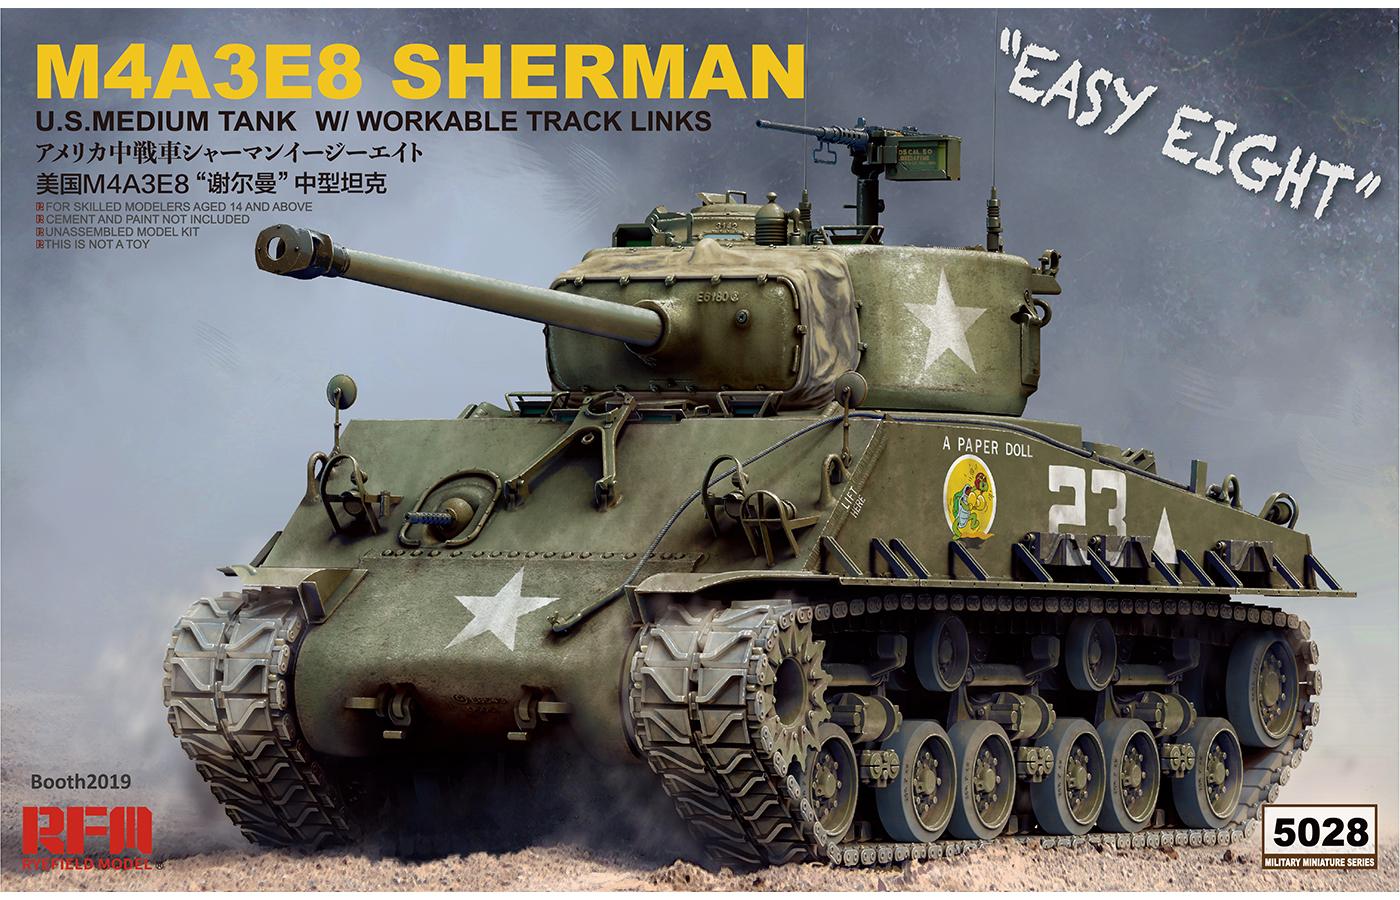 RM-5028 SHERMAN